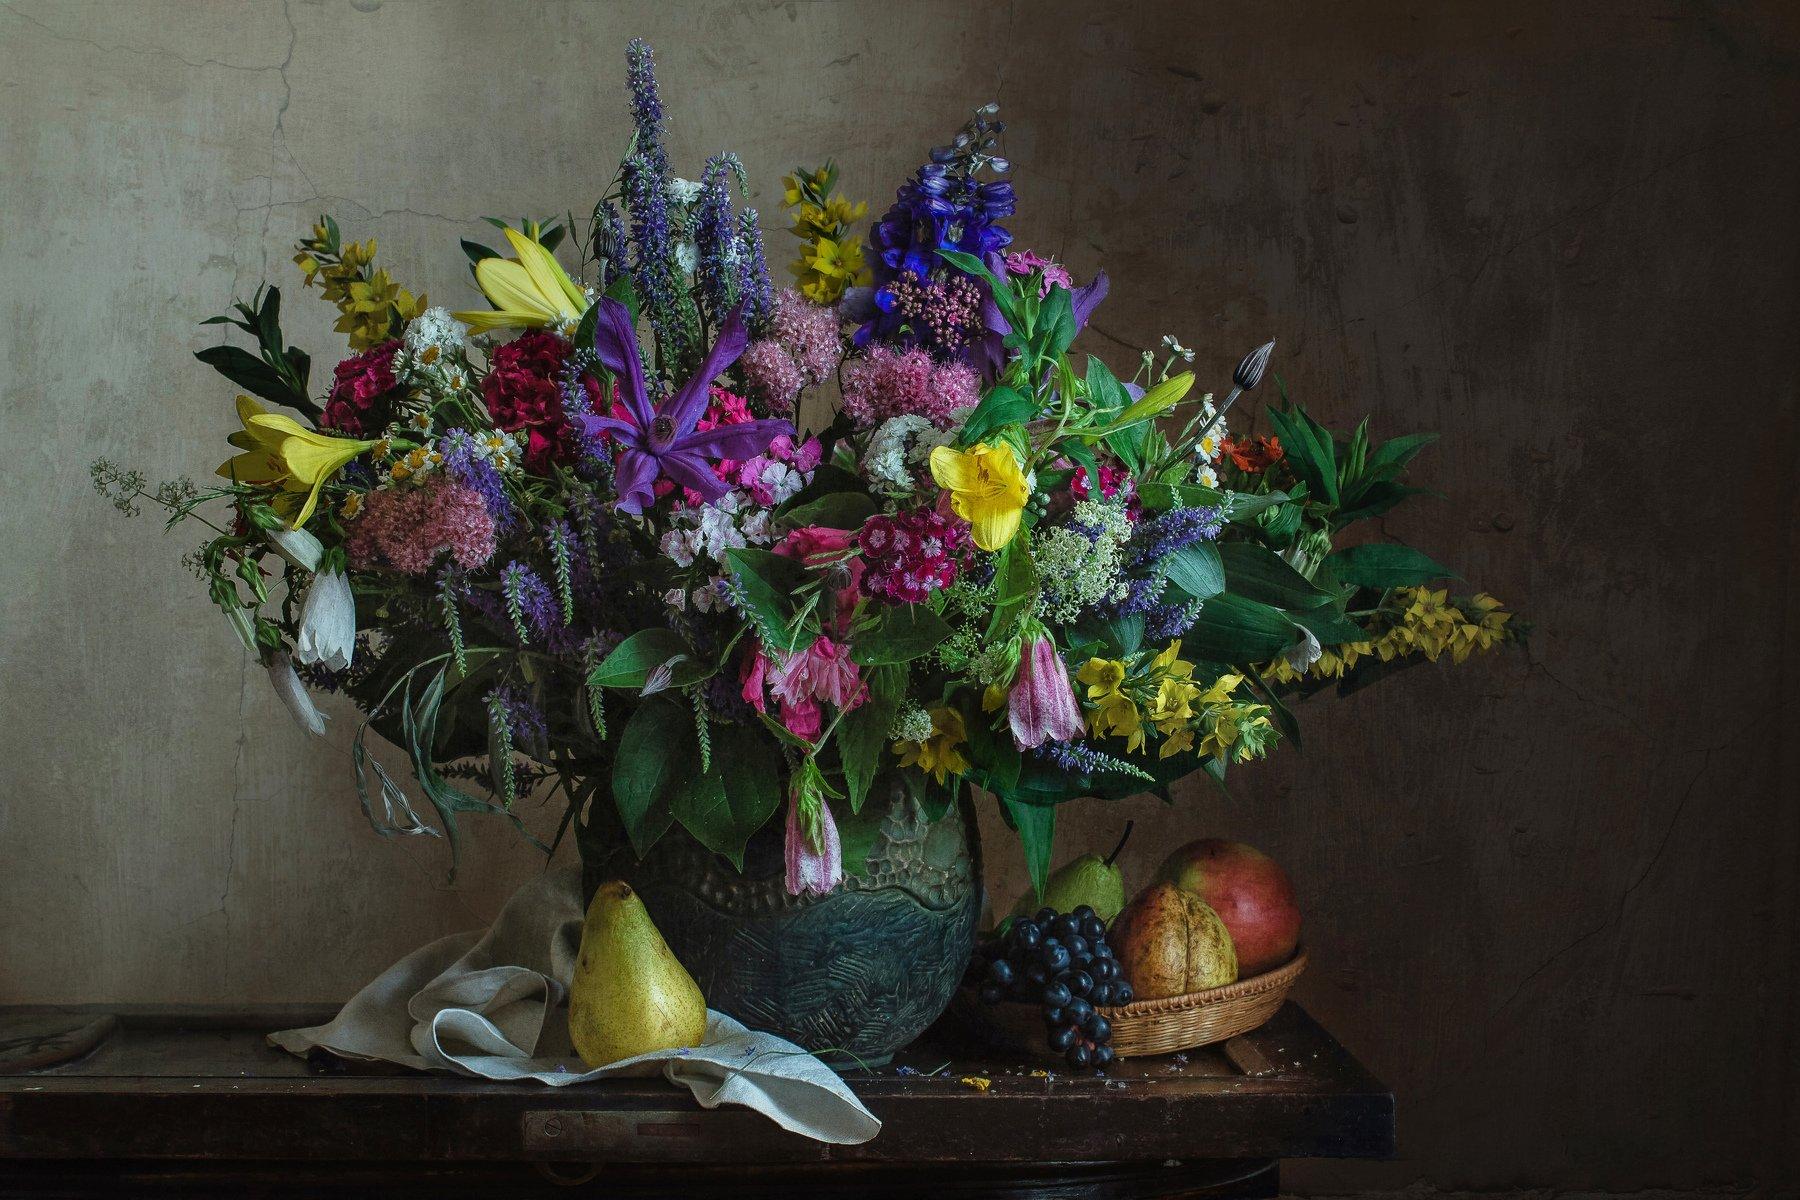 натюрморт, цветы, фрукты, груши, виноград, Анна Петина